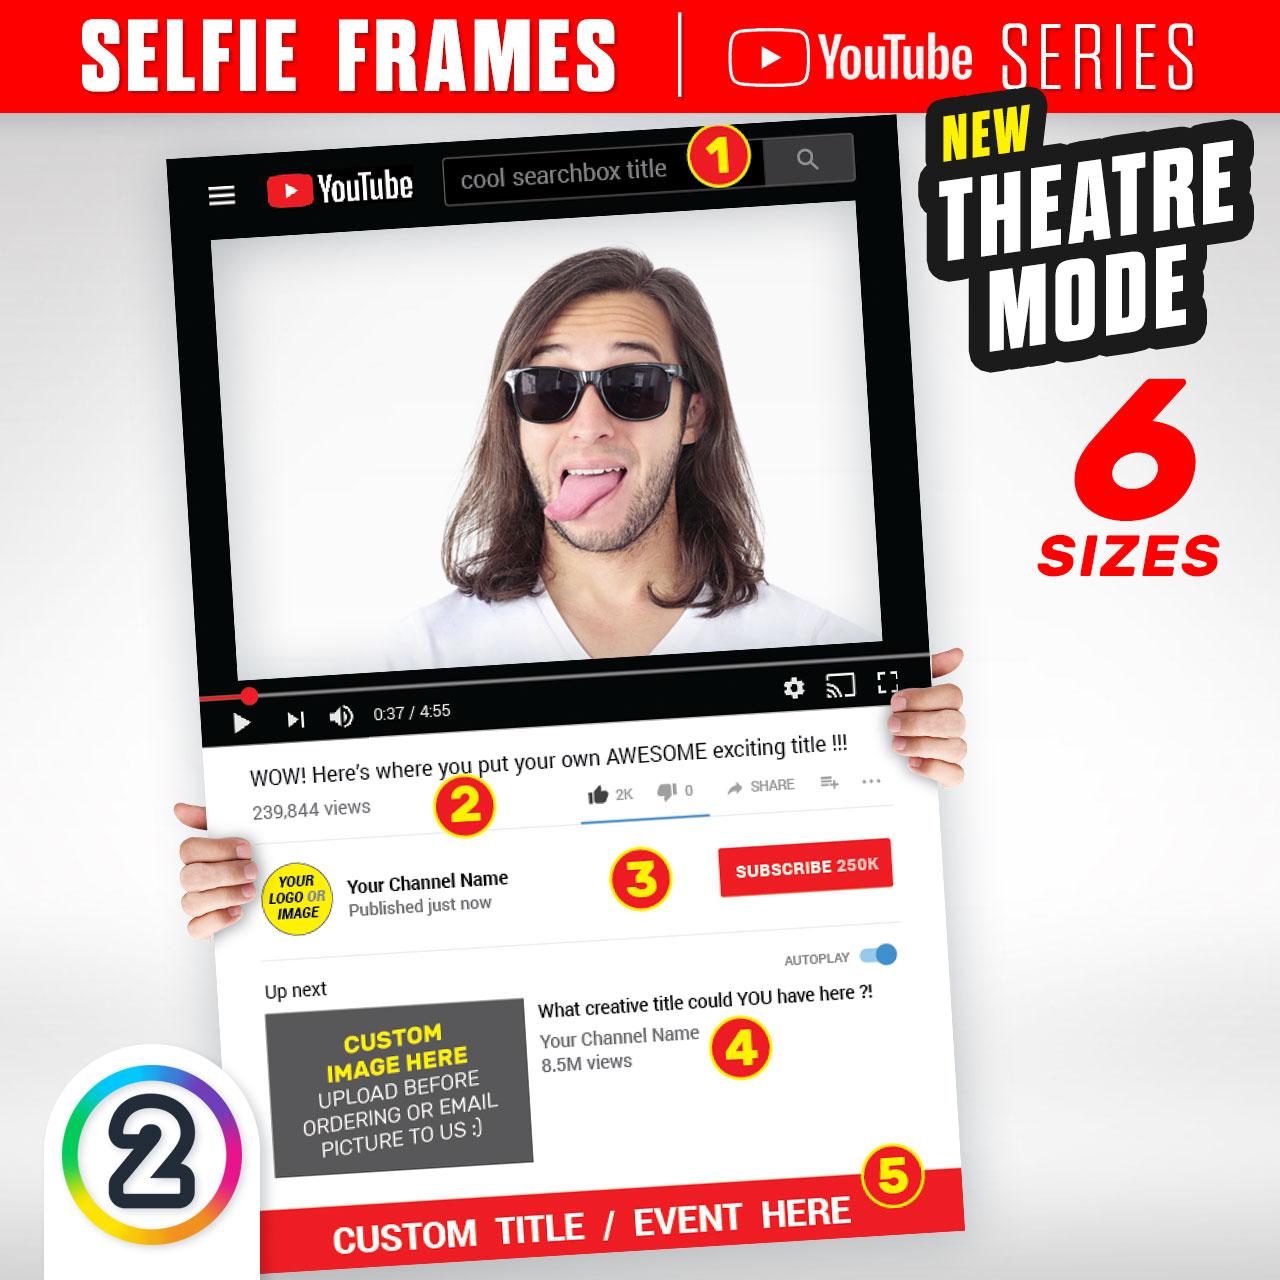 Buy YouTube \'Theatre Mode\' Selfie Frames online Australia - from ...